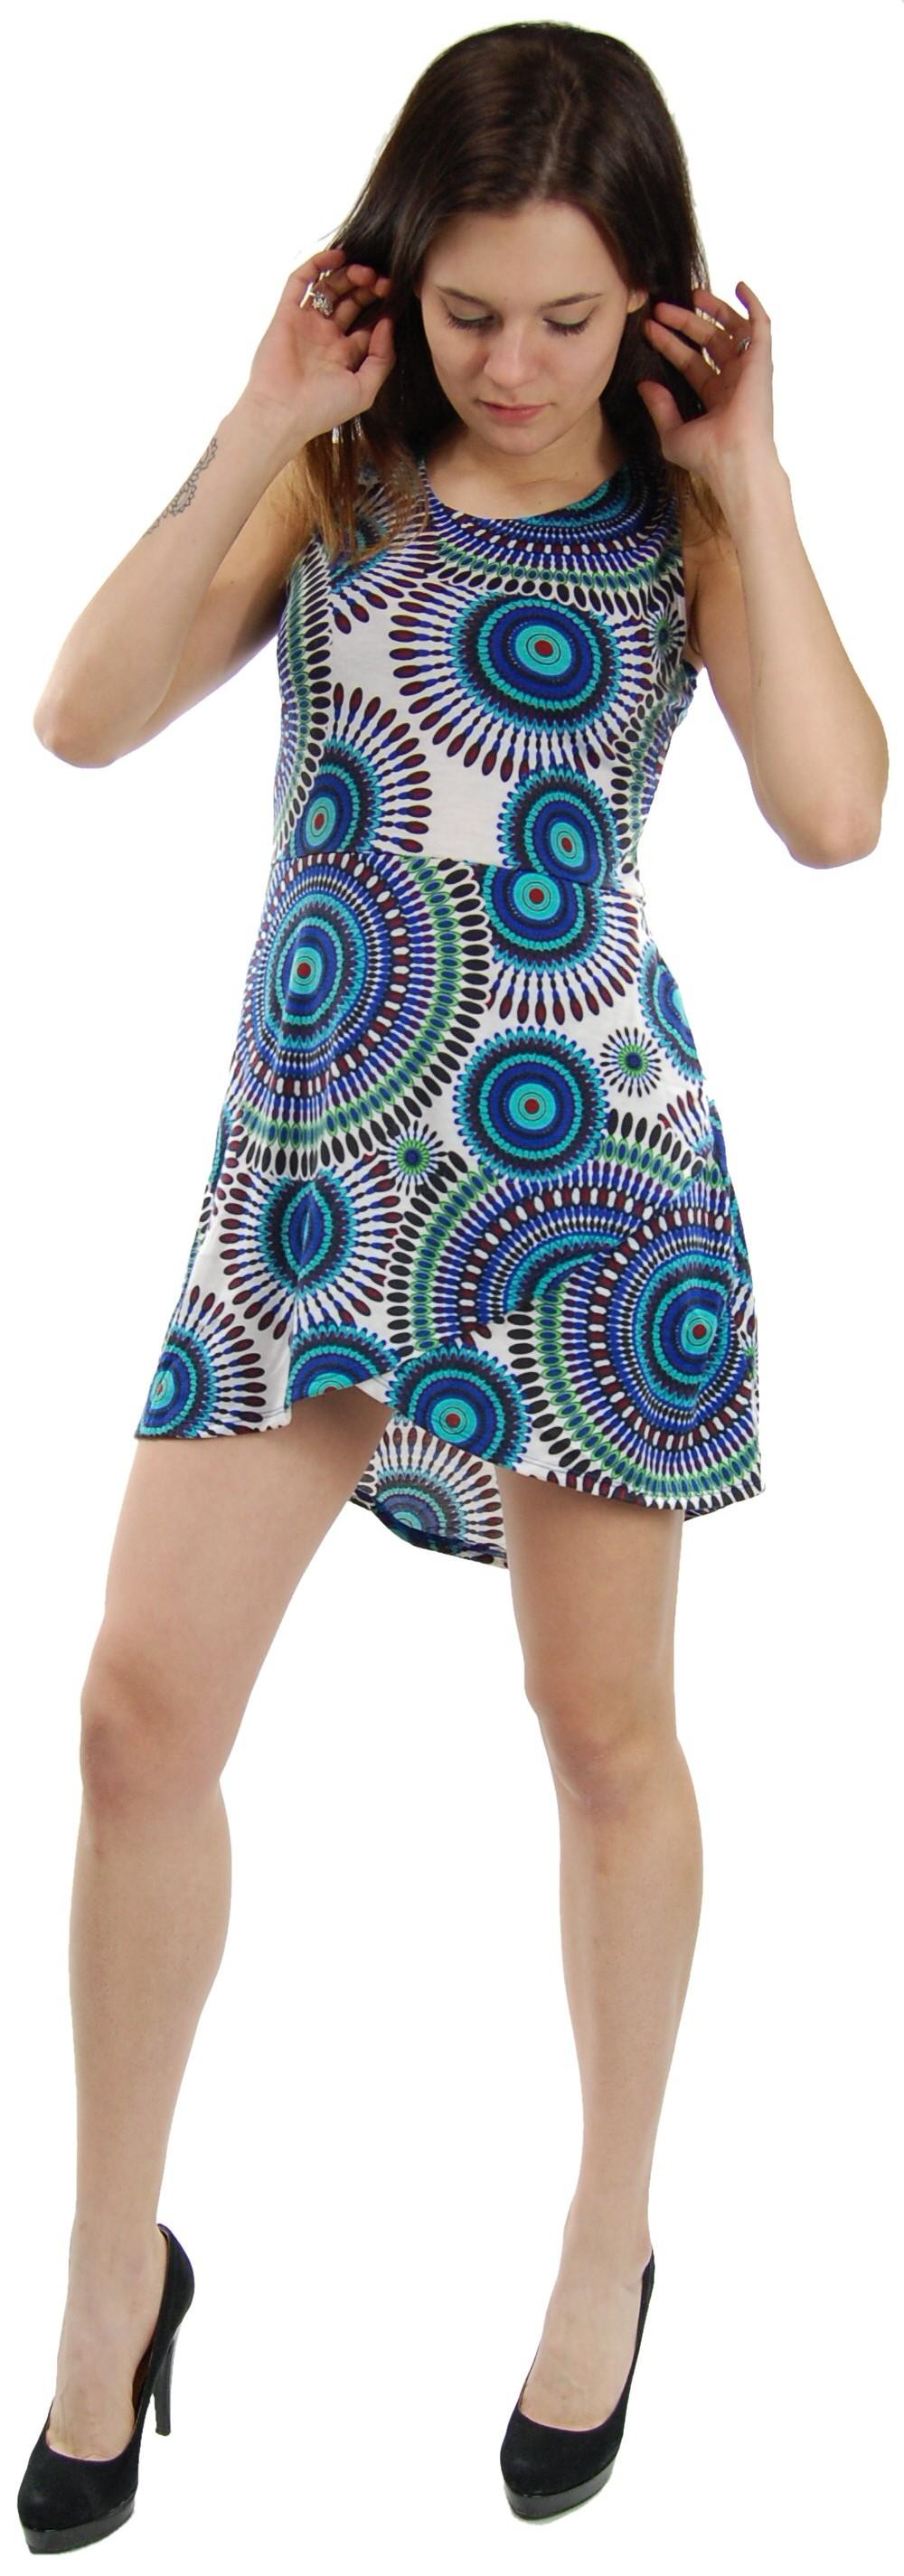 SUMMER SLEEVELESS JERSEY DRESSES AB-MRS377-F2 - com Etnika Slog d.o.o.